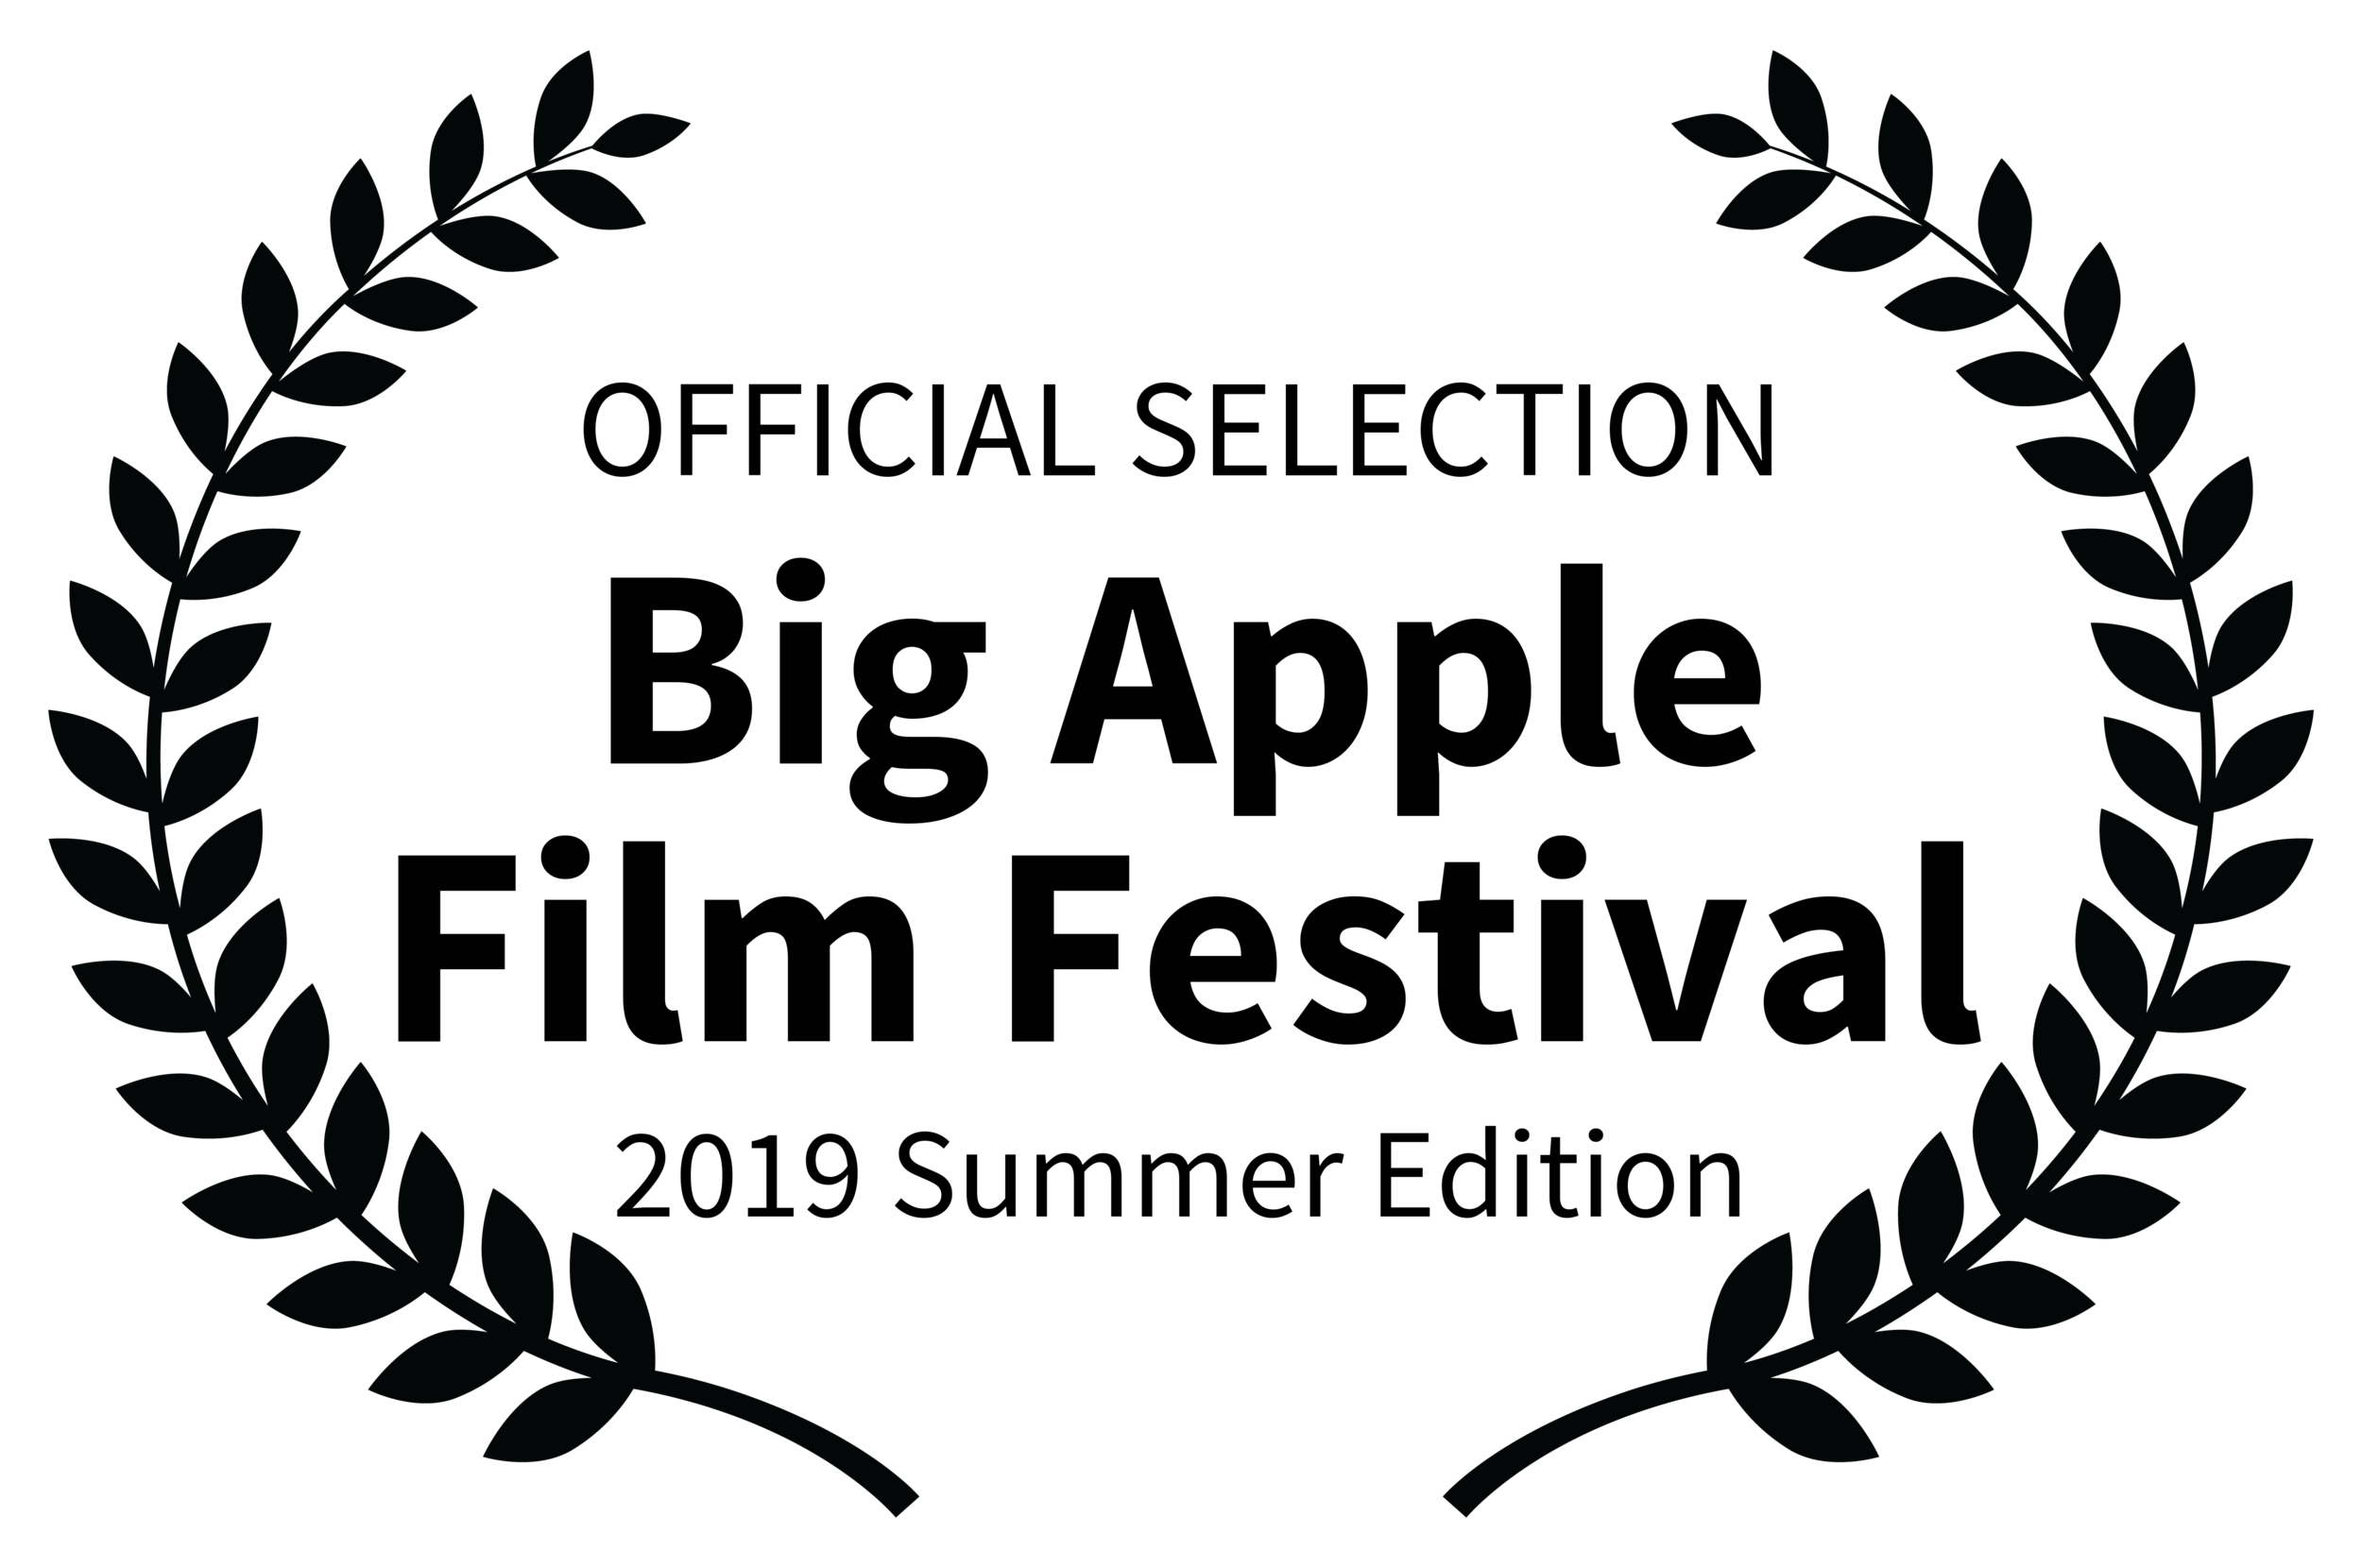 OFFICIALSELECTION-BigAppleFilmFestival-2019SummerEdition.png